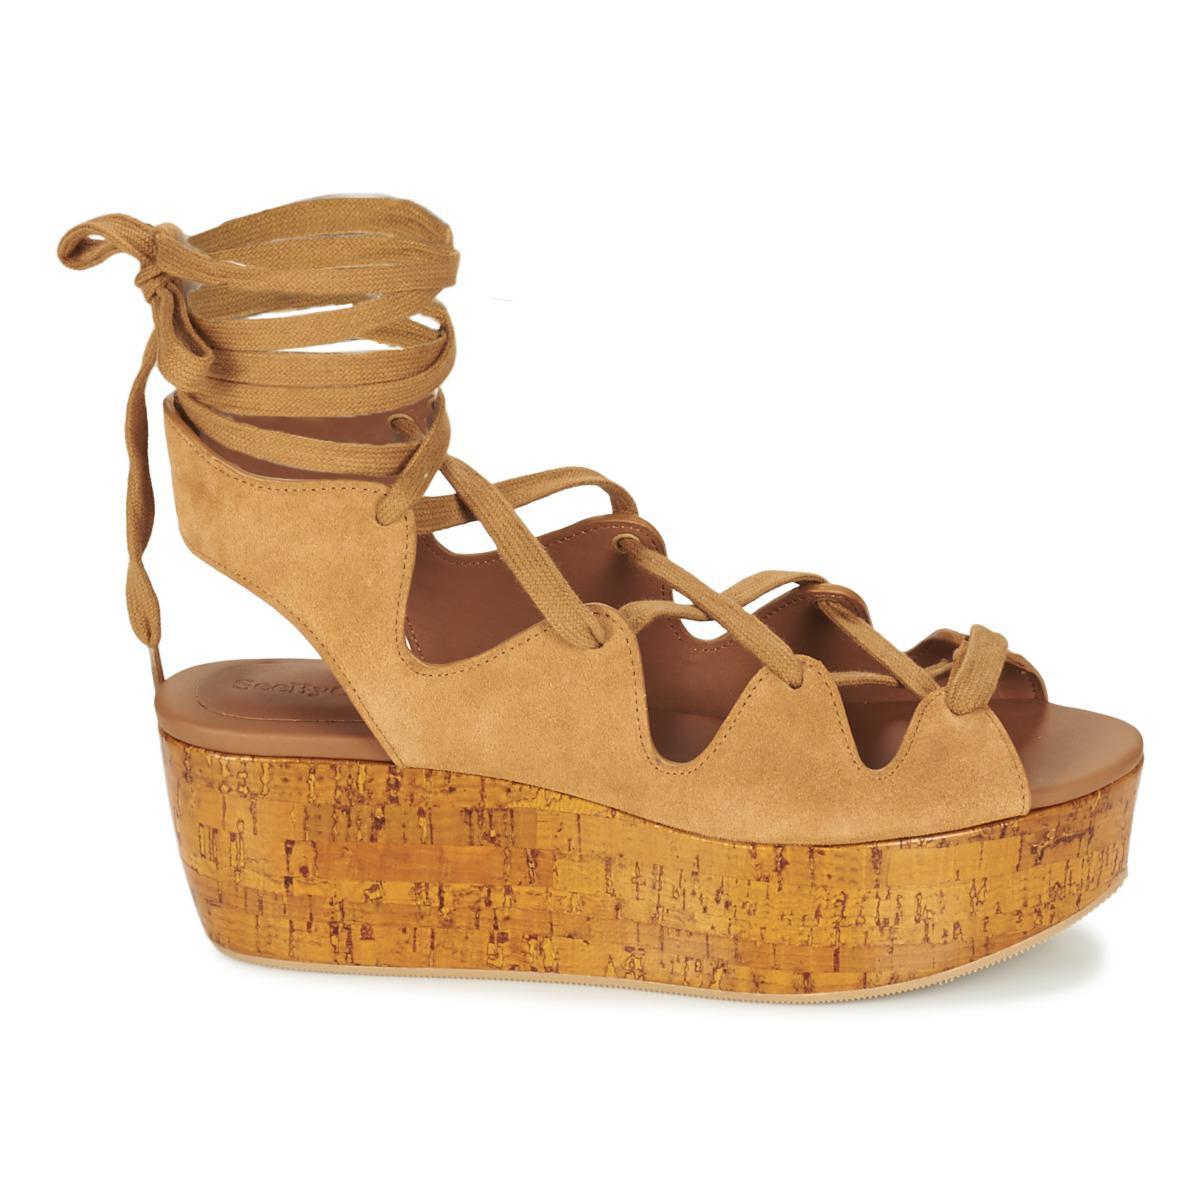 Chloé SB24200 women's Sandals in Cheap Sale Cheap Footlocker Pictures Sale Online Free Shipping Cost Free Shipping Clearance Free Shipping Footlocker YEaJvGAK